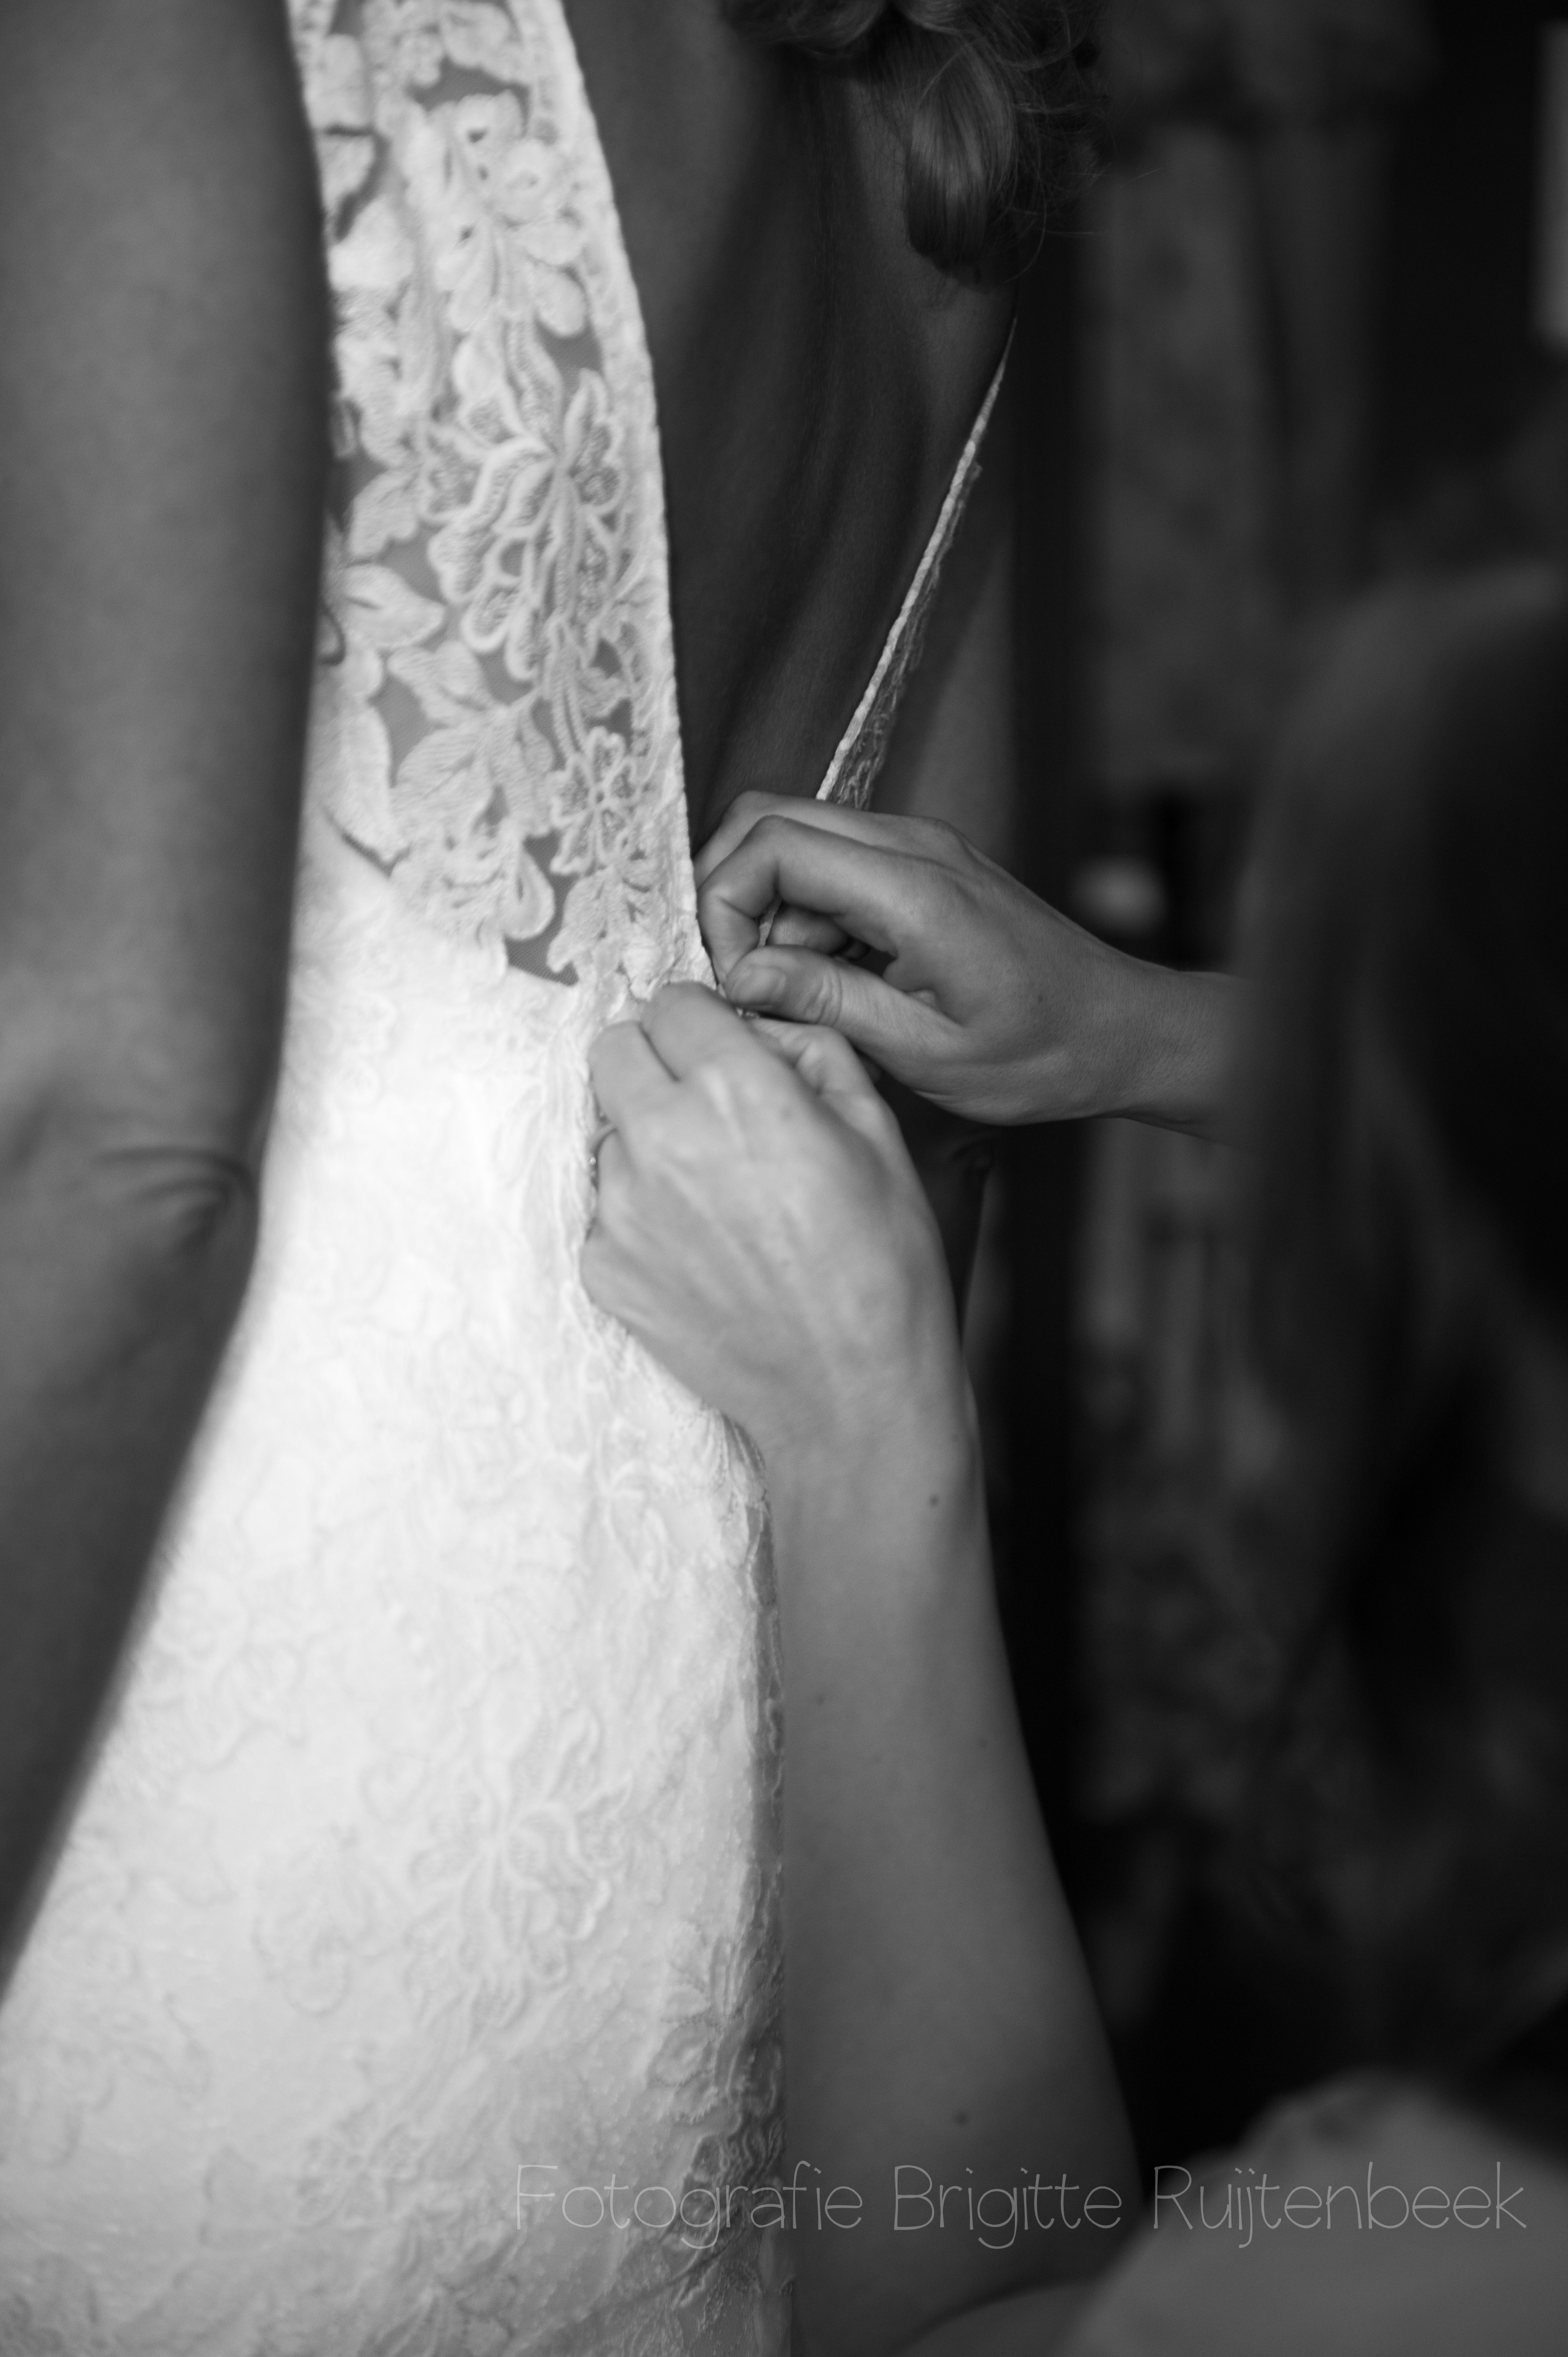 Bruidsjurk wordt dichtgeknoopt